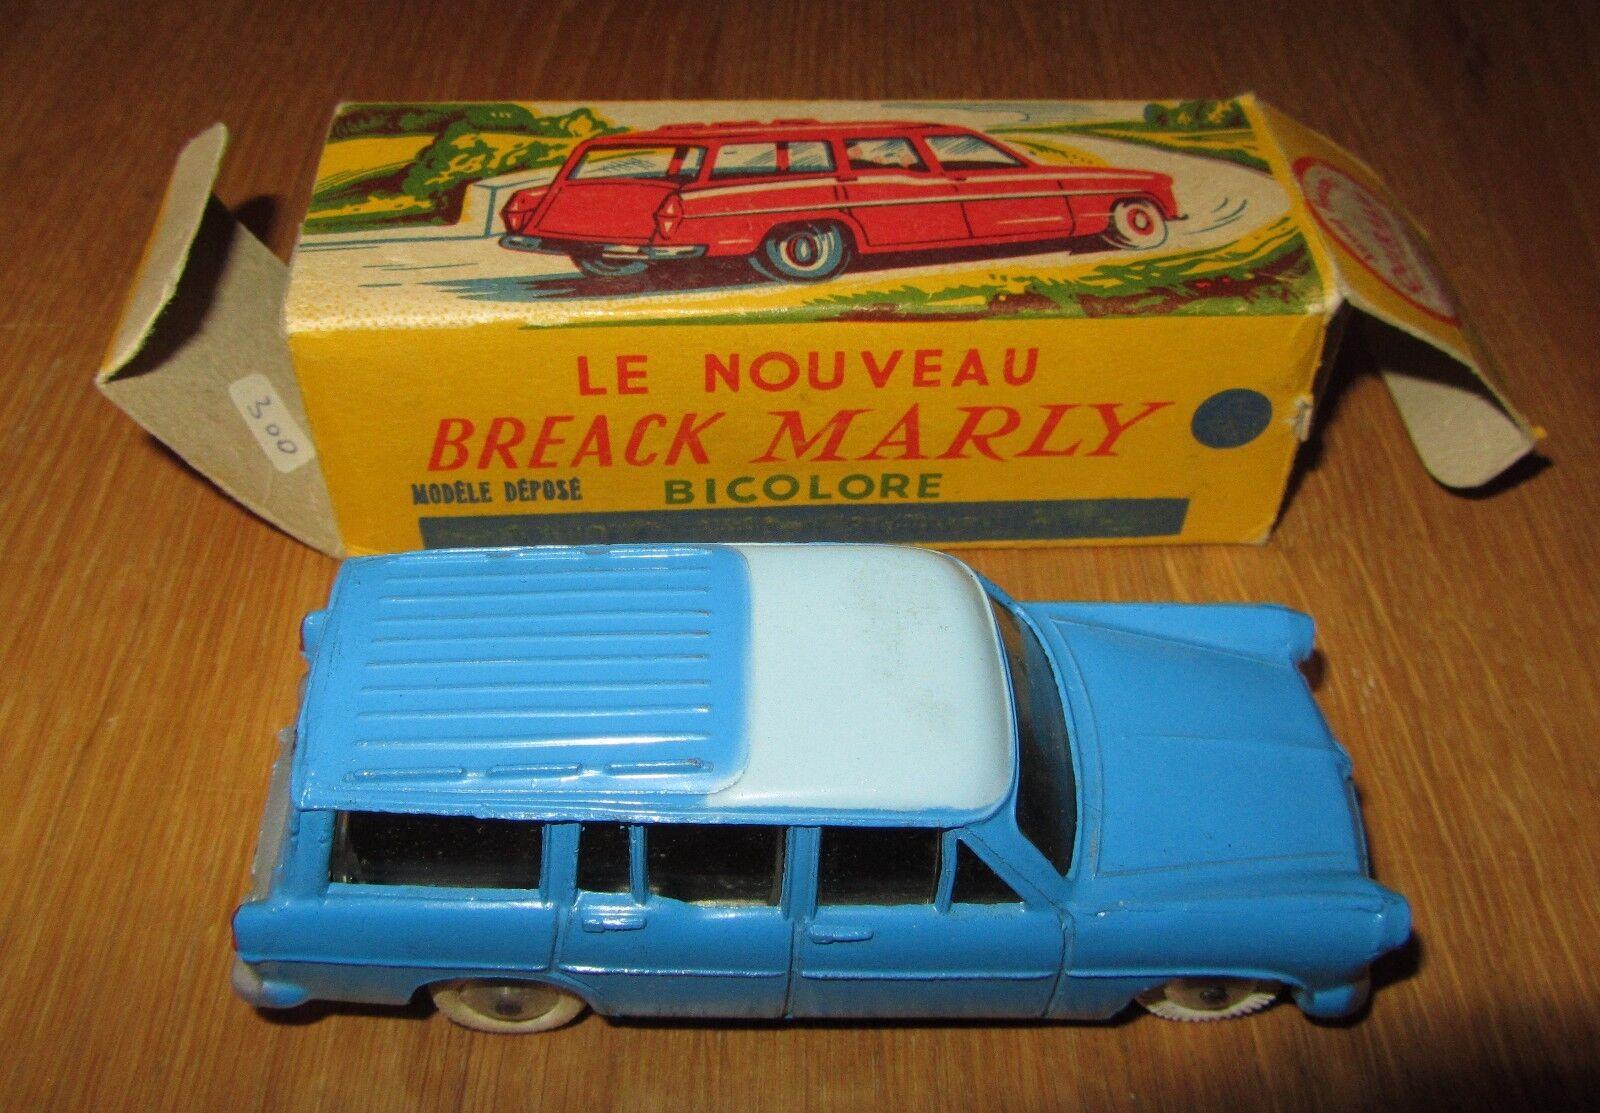 las mejores marcas venden barato Quiralu Break Simca Simca Simca Marly original Box mint original model (not re-edition) 1 43  solo para ti